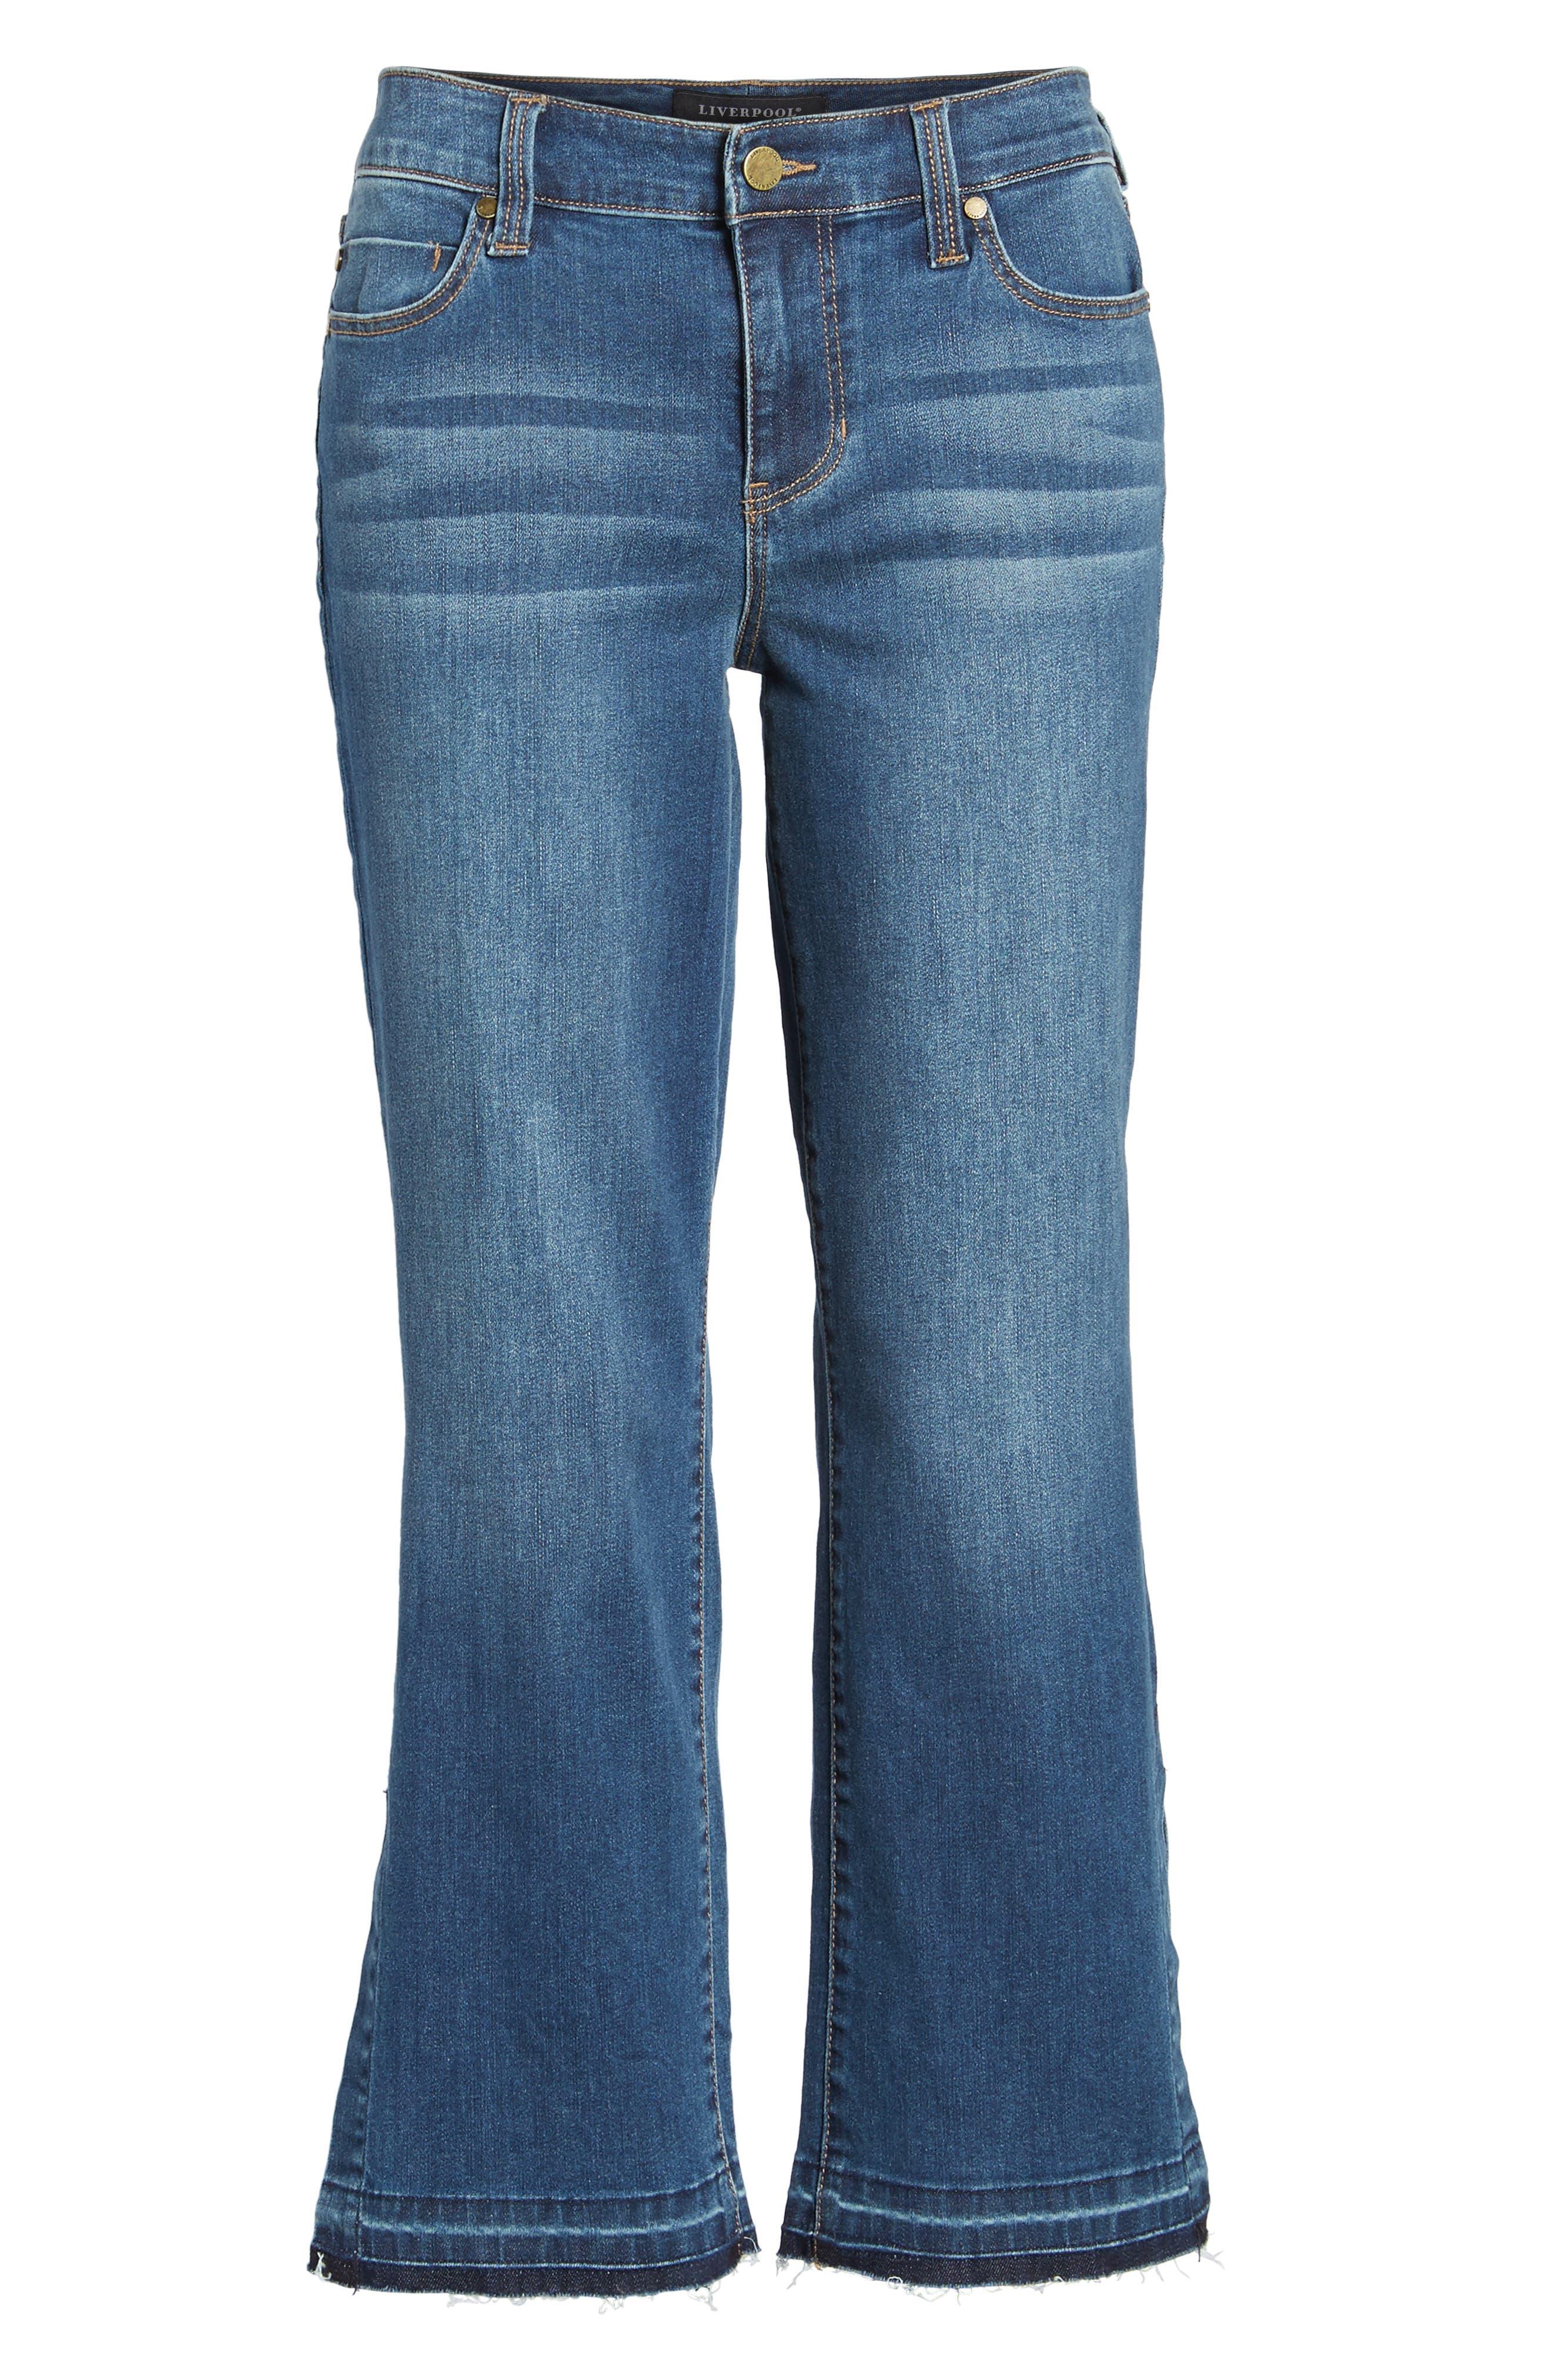 Tabitha Release Hem Crop Jeans,                             Alternate thumbnail 7, color,                             403